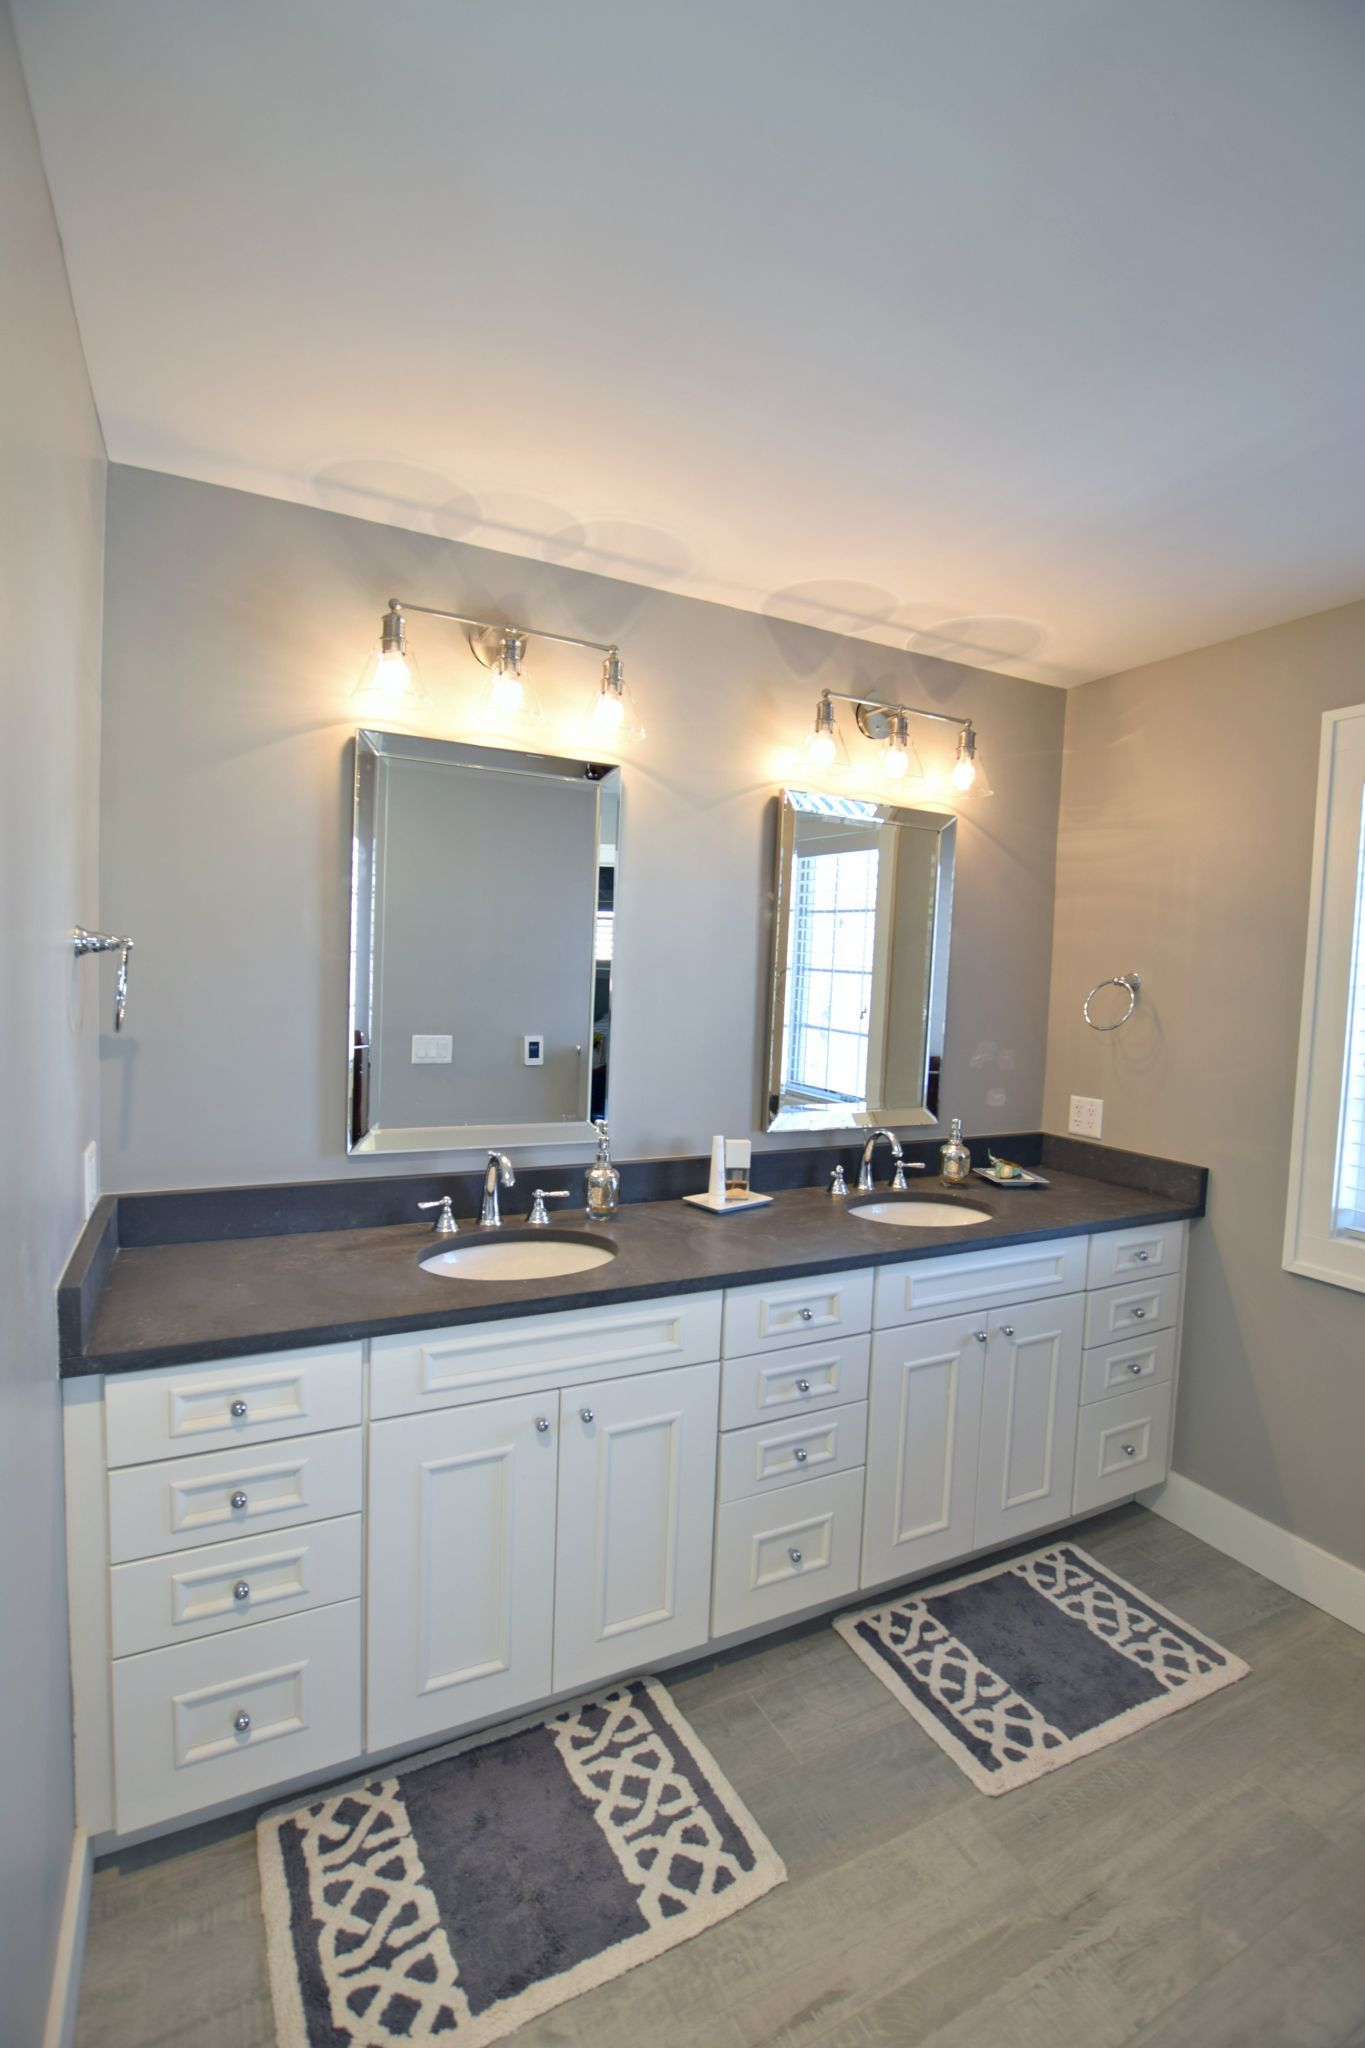 Baths Kitchen Bathroom Remodel Bathroom Remodel Pictures Bathroom Vanity